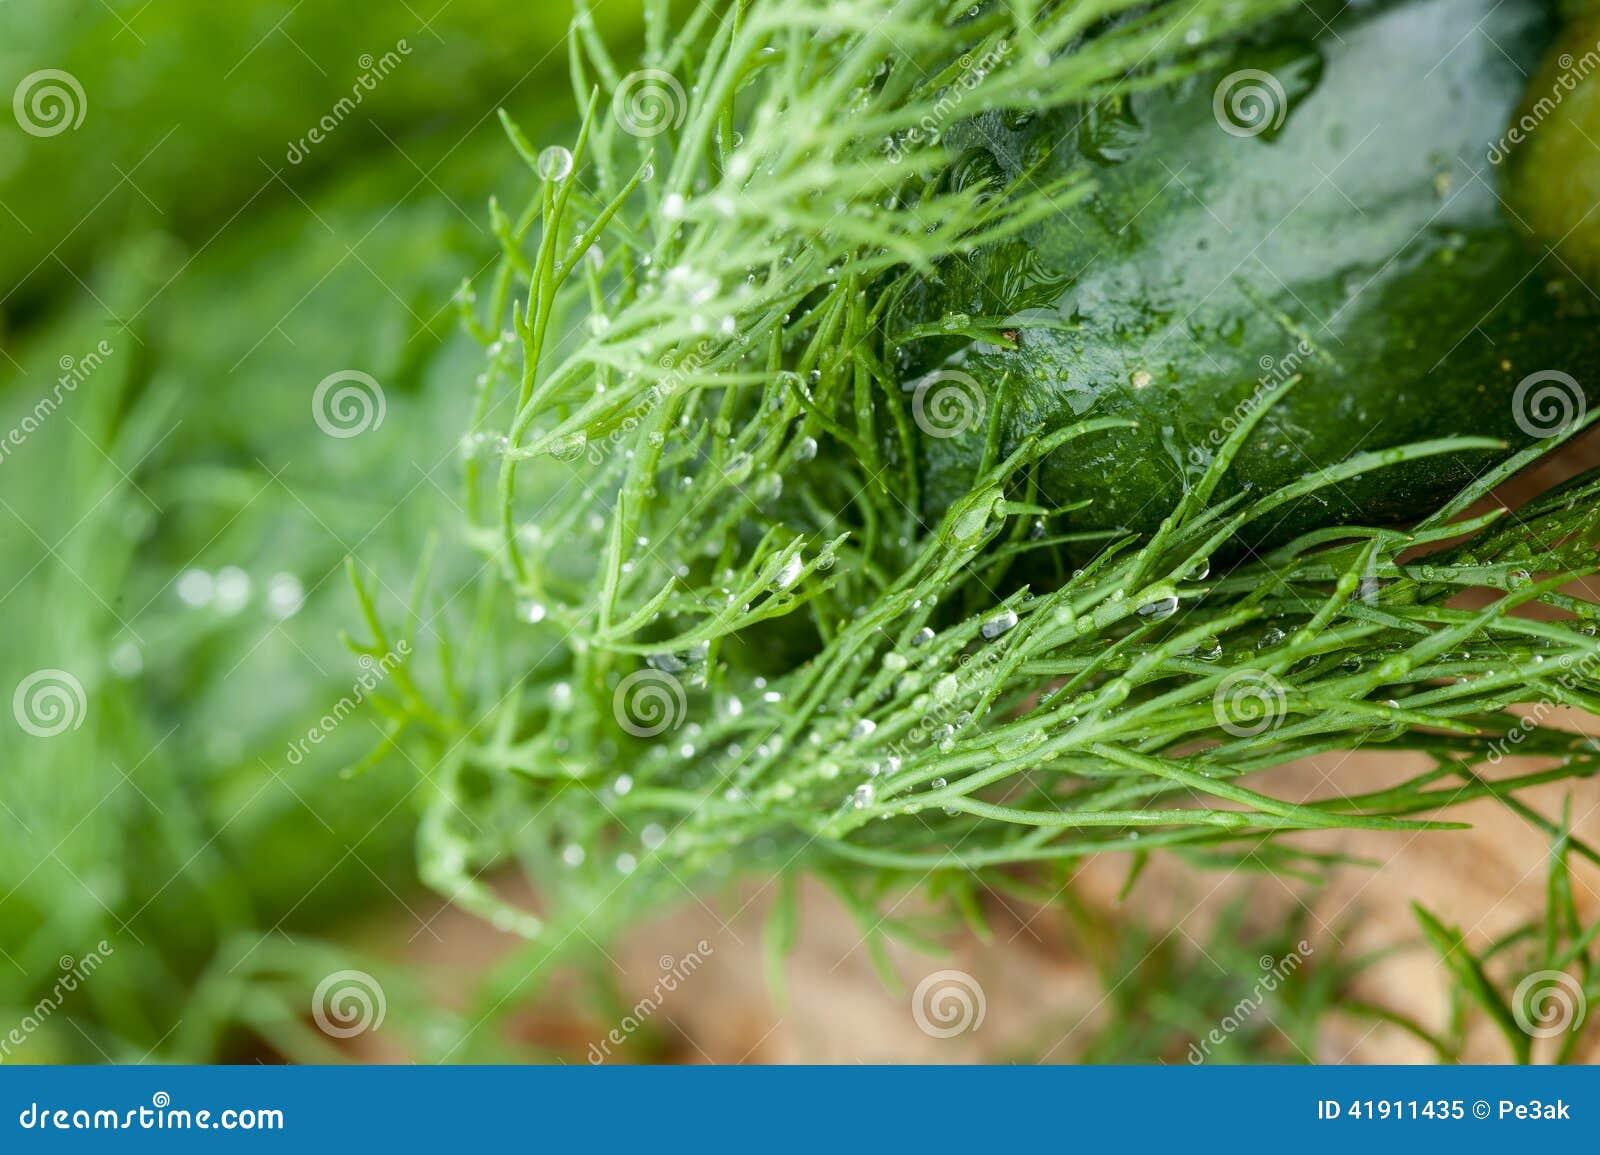 Eneldo fresco verde con descensos del agua